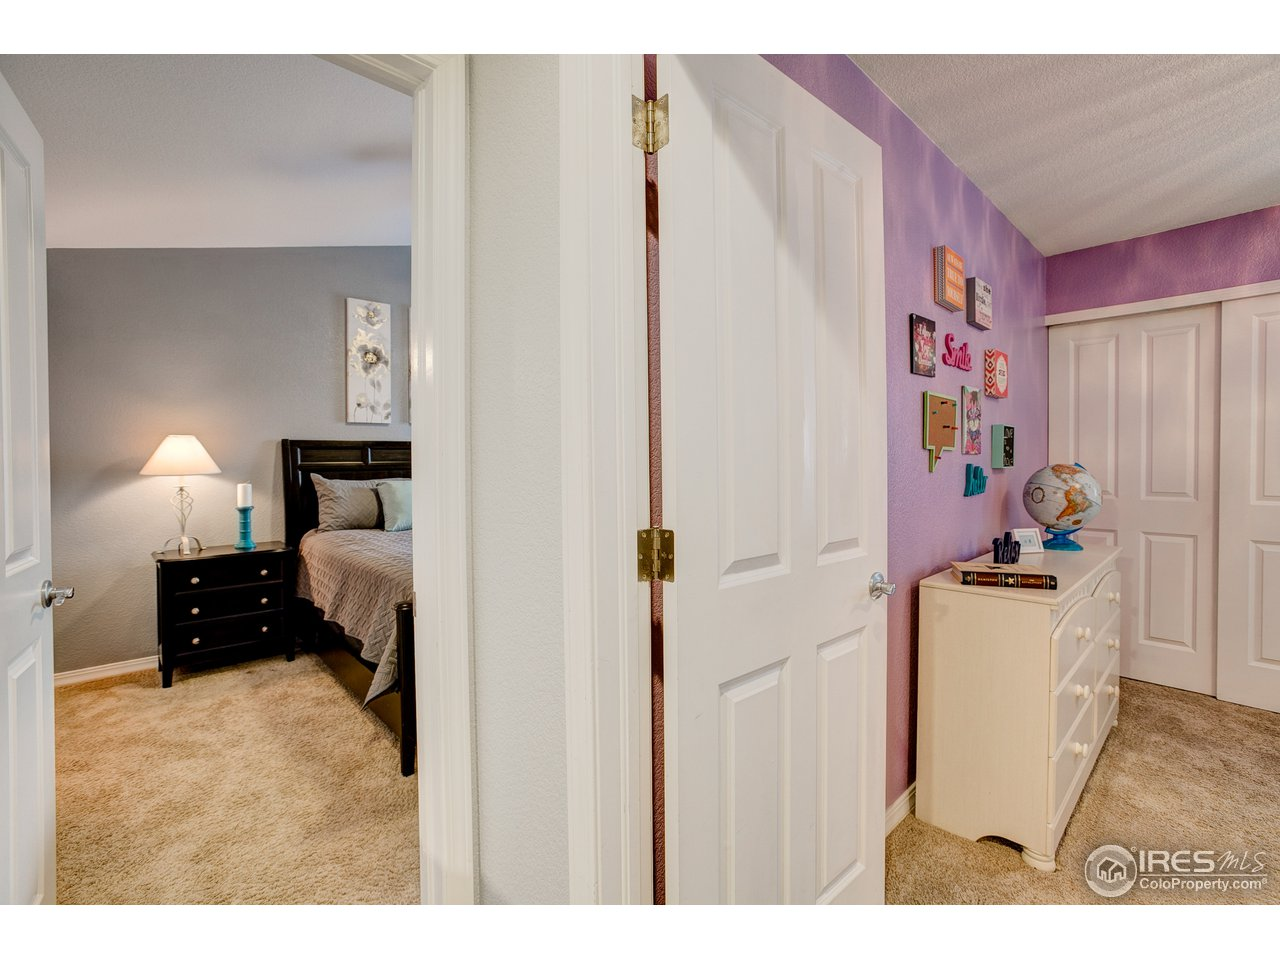 2 Spacious Bedrooms Upstairs